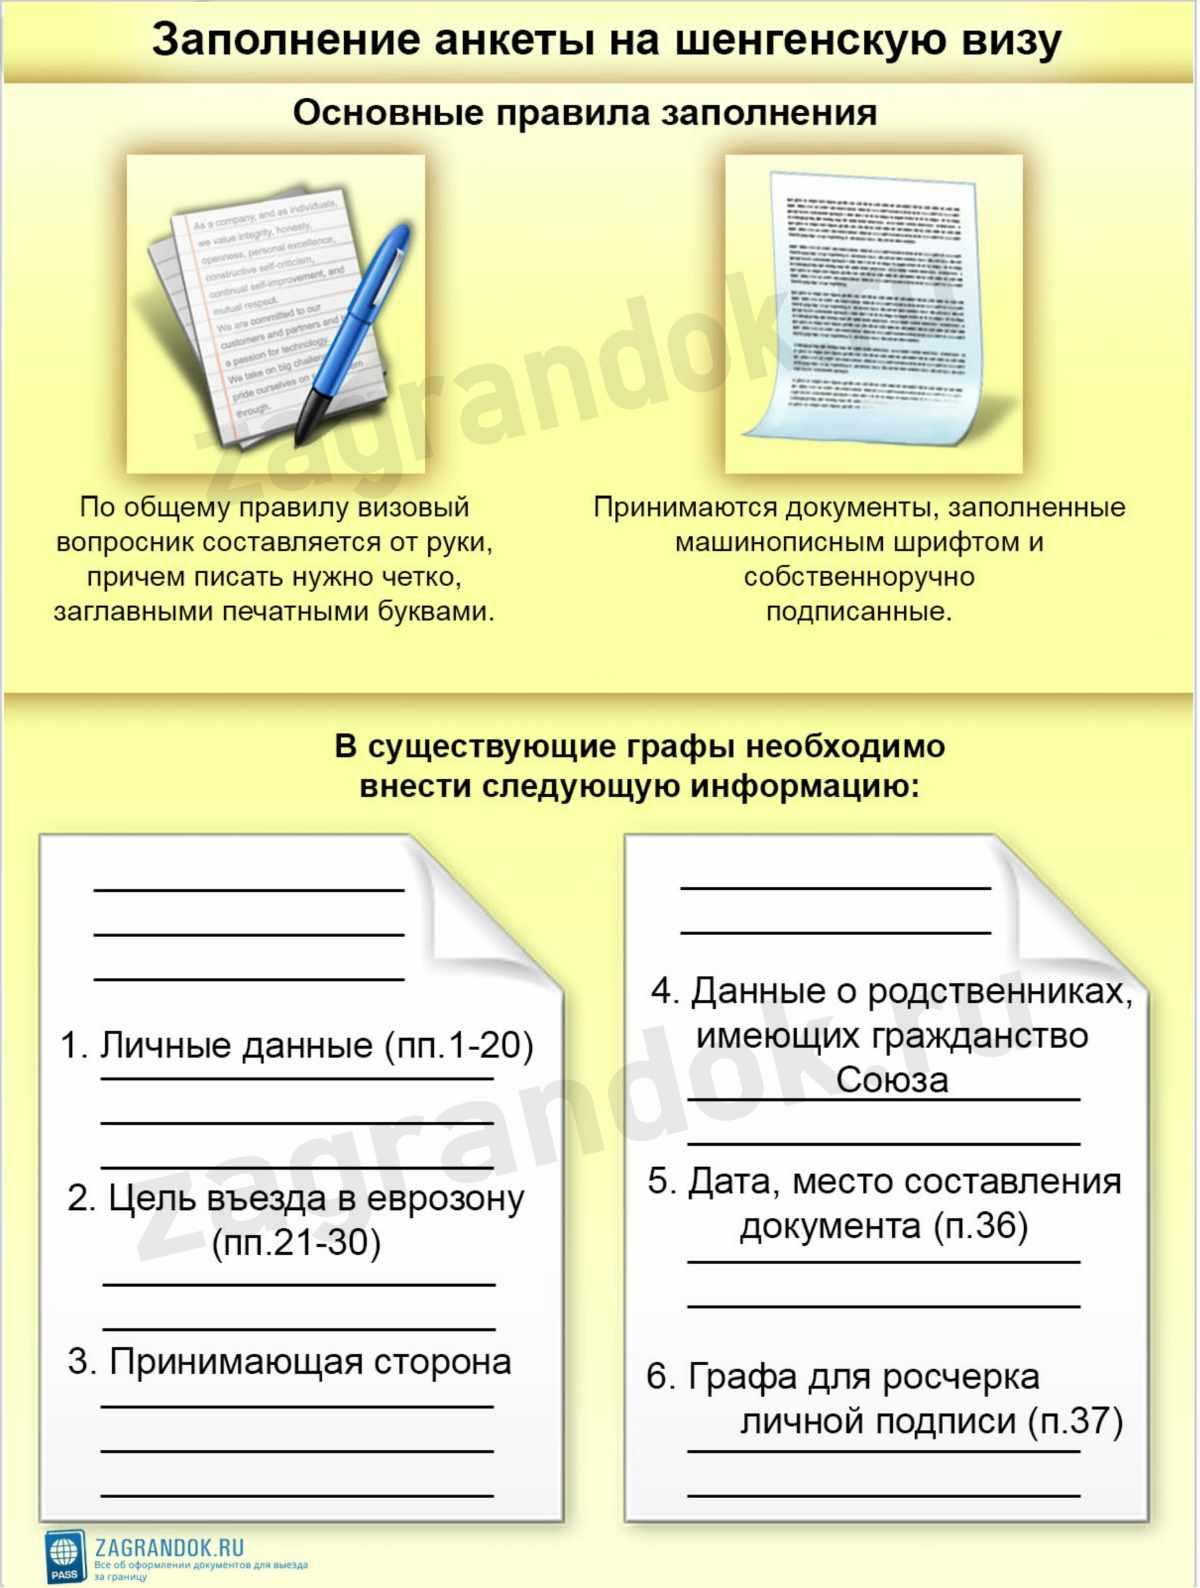 образец анкеты форма 4 для военкомата